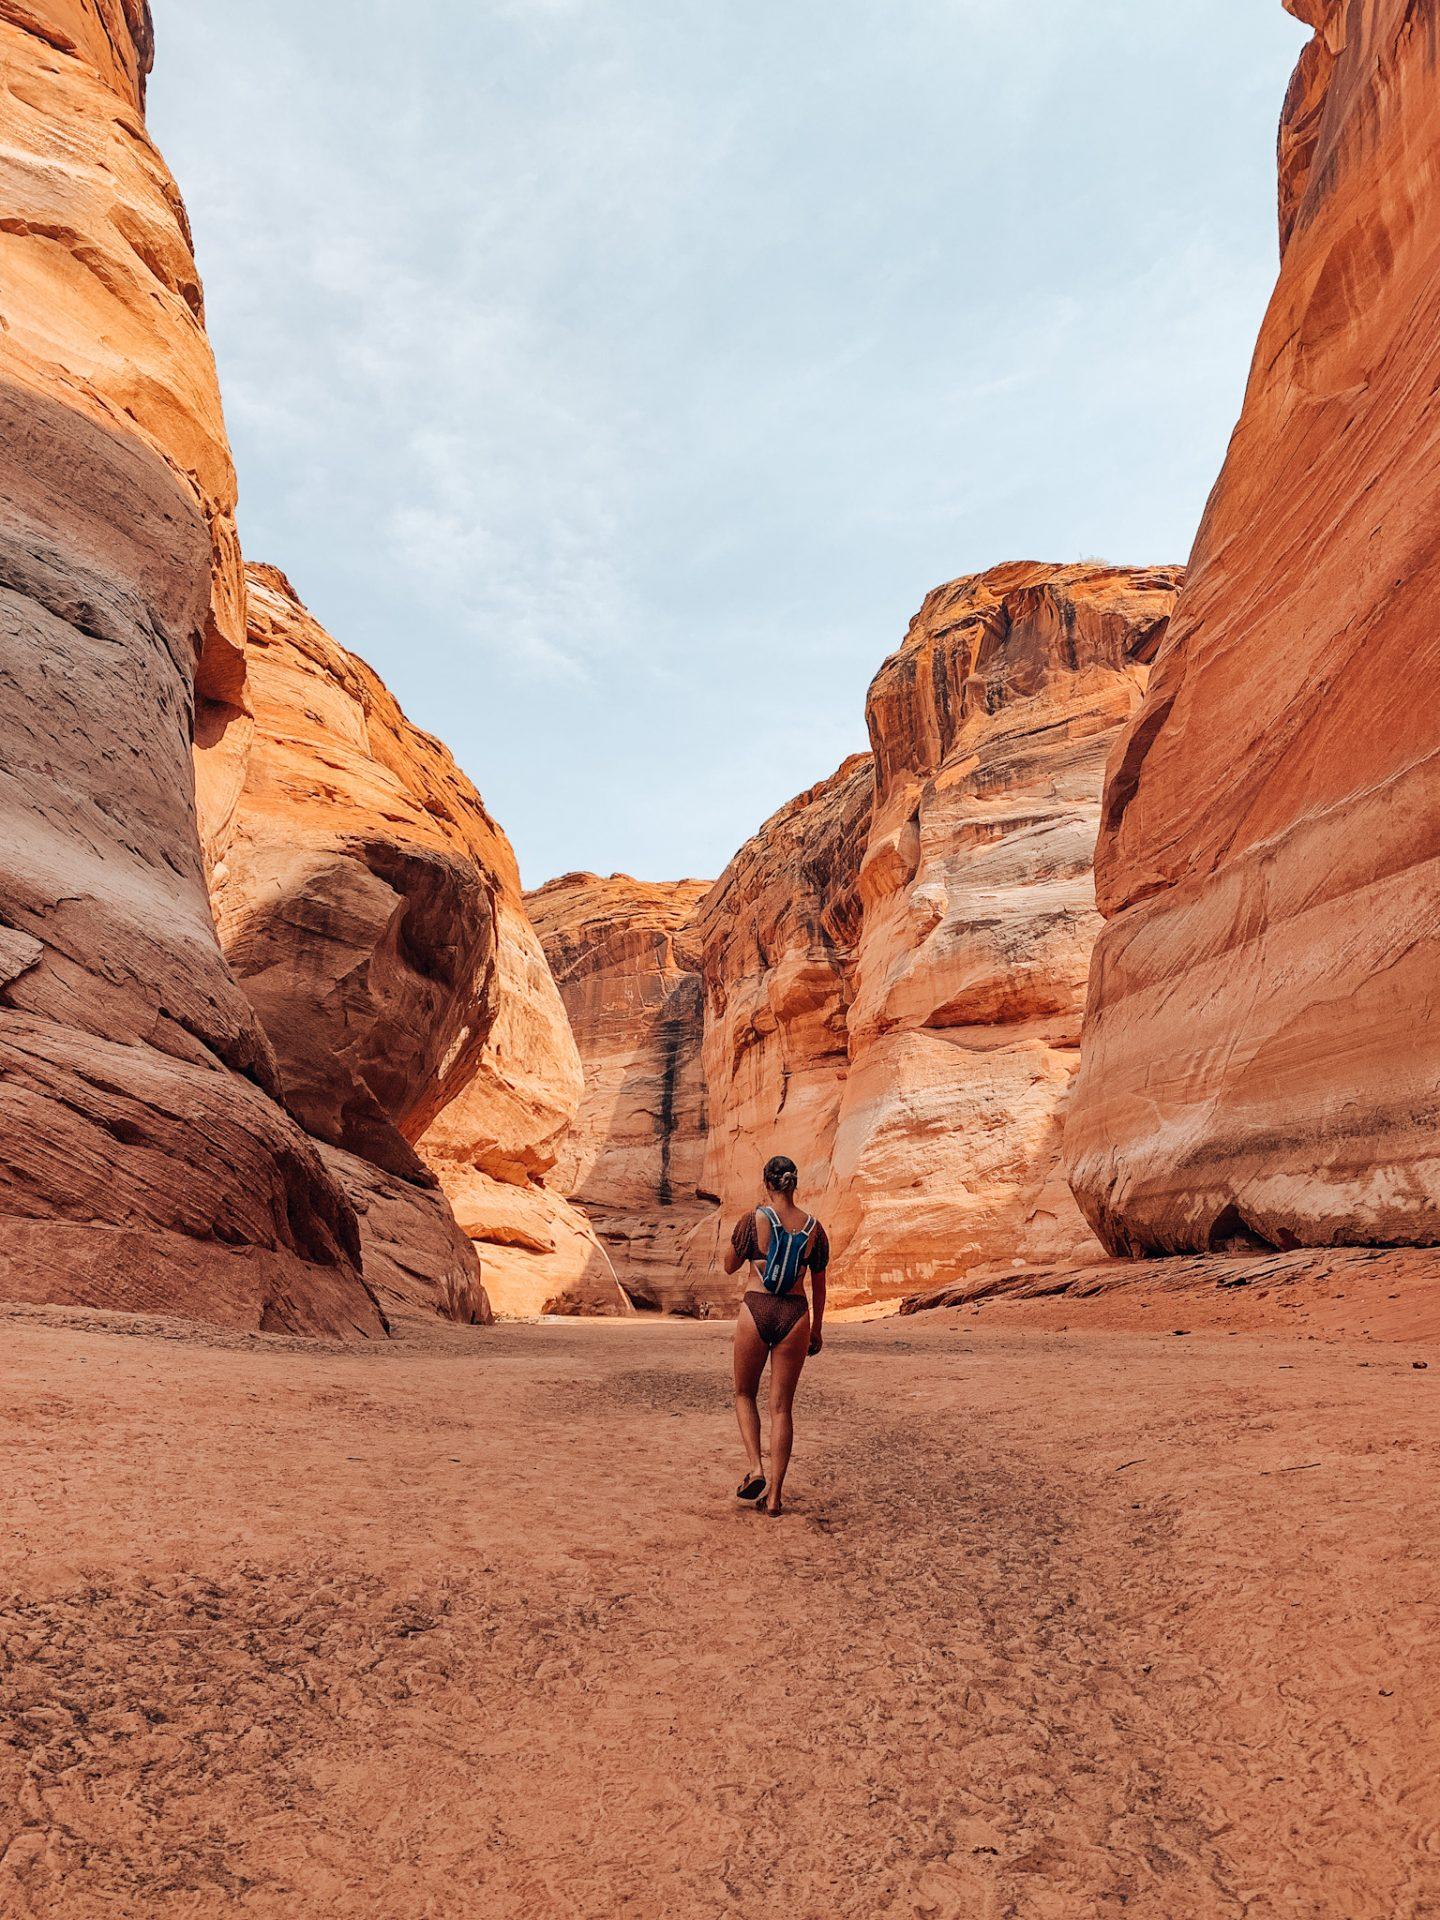 Hiking through Lower Antelope Canyon in Page, AZ